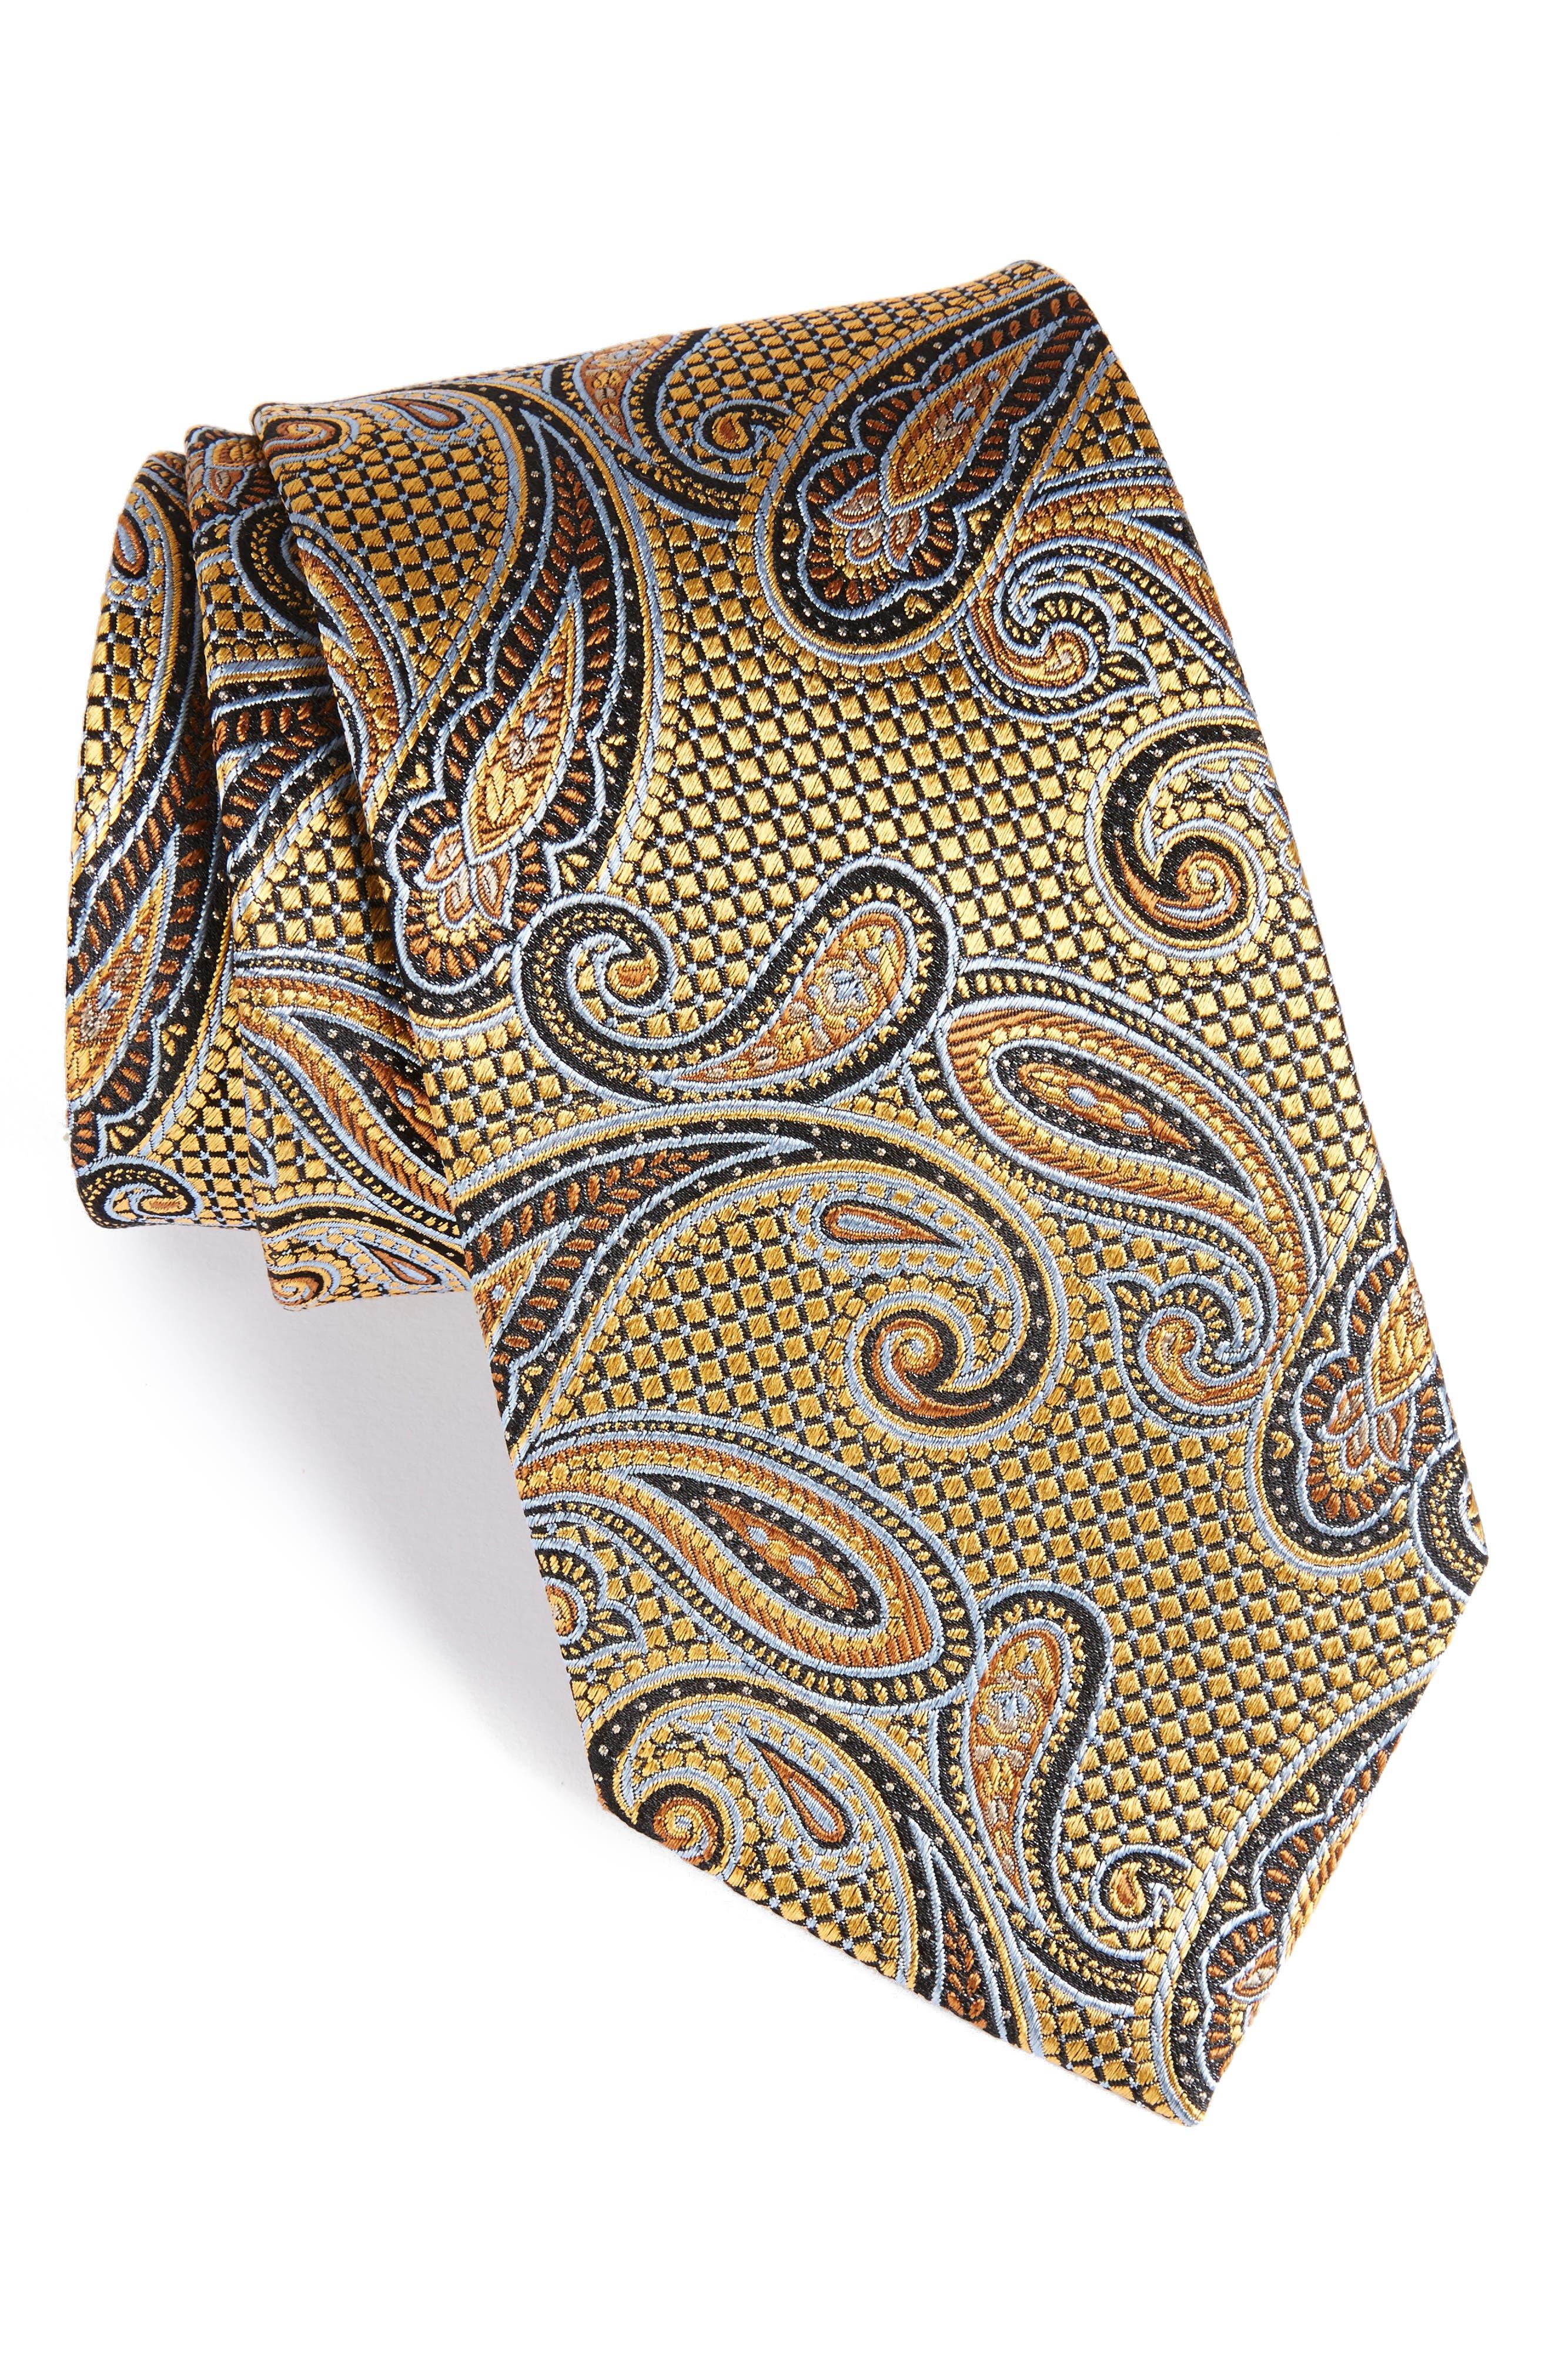 Main Image - Nordstrom Men's Shop Paisley Silk Tie (X-Long)